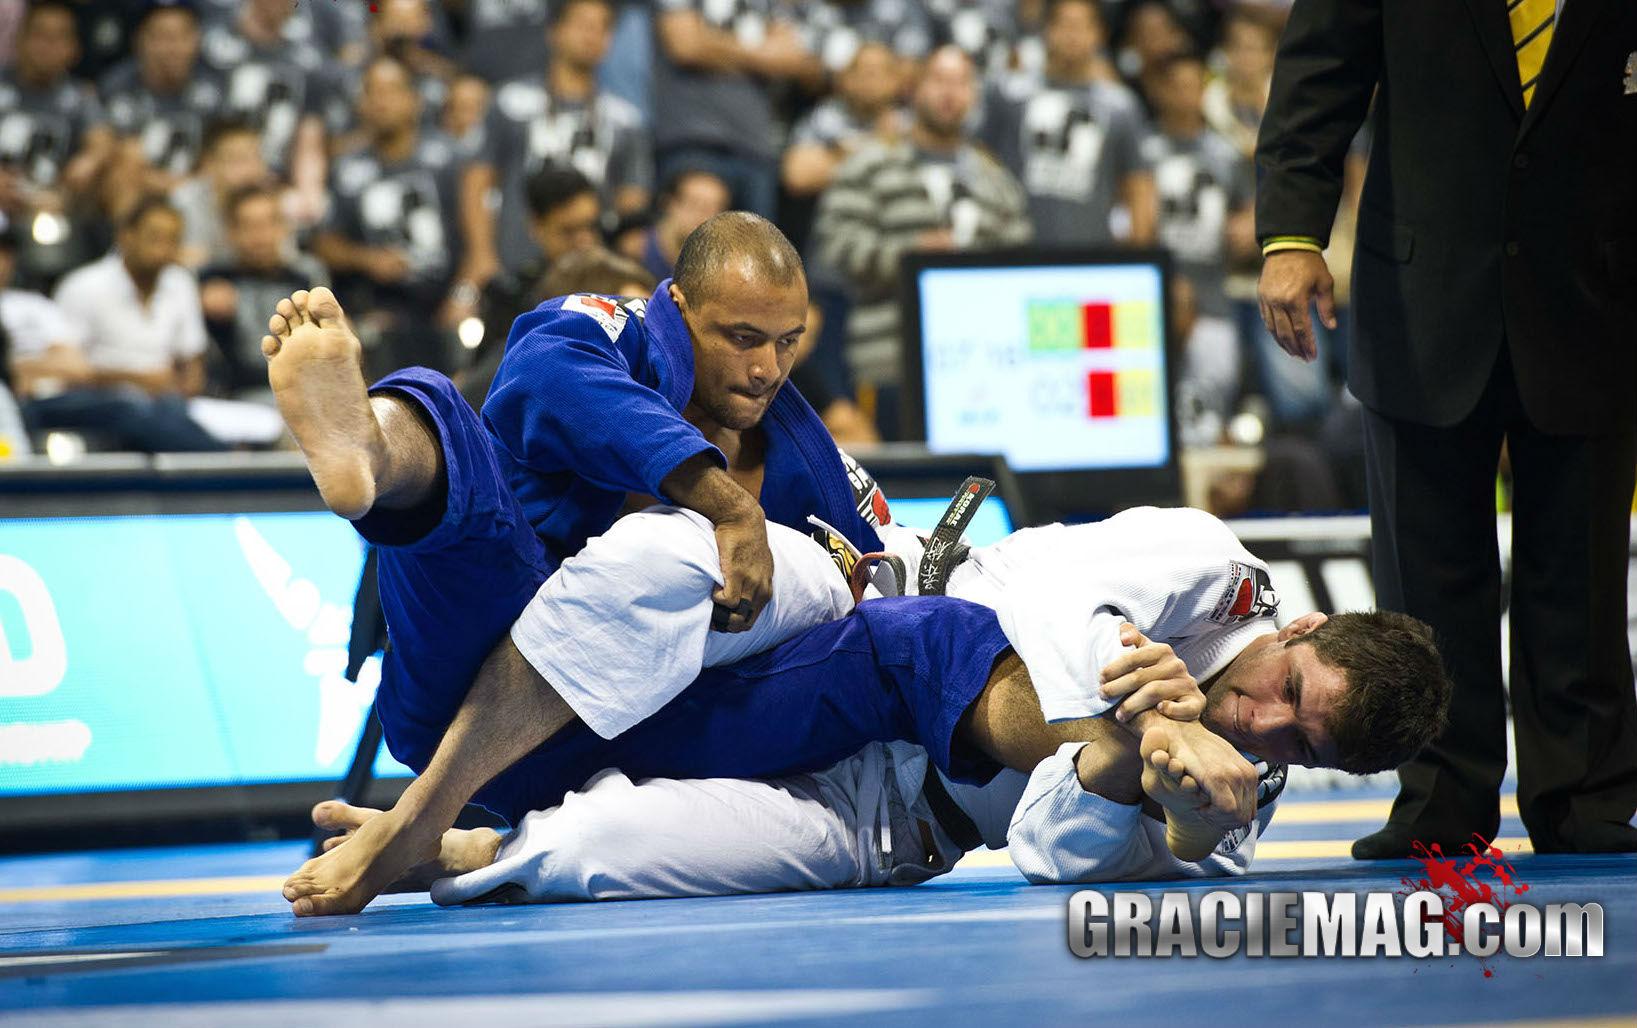 Marcus Buchecha arrocha o pe do adversário. Foto: Dan Rod/GRACIEMAG